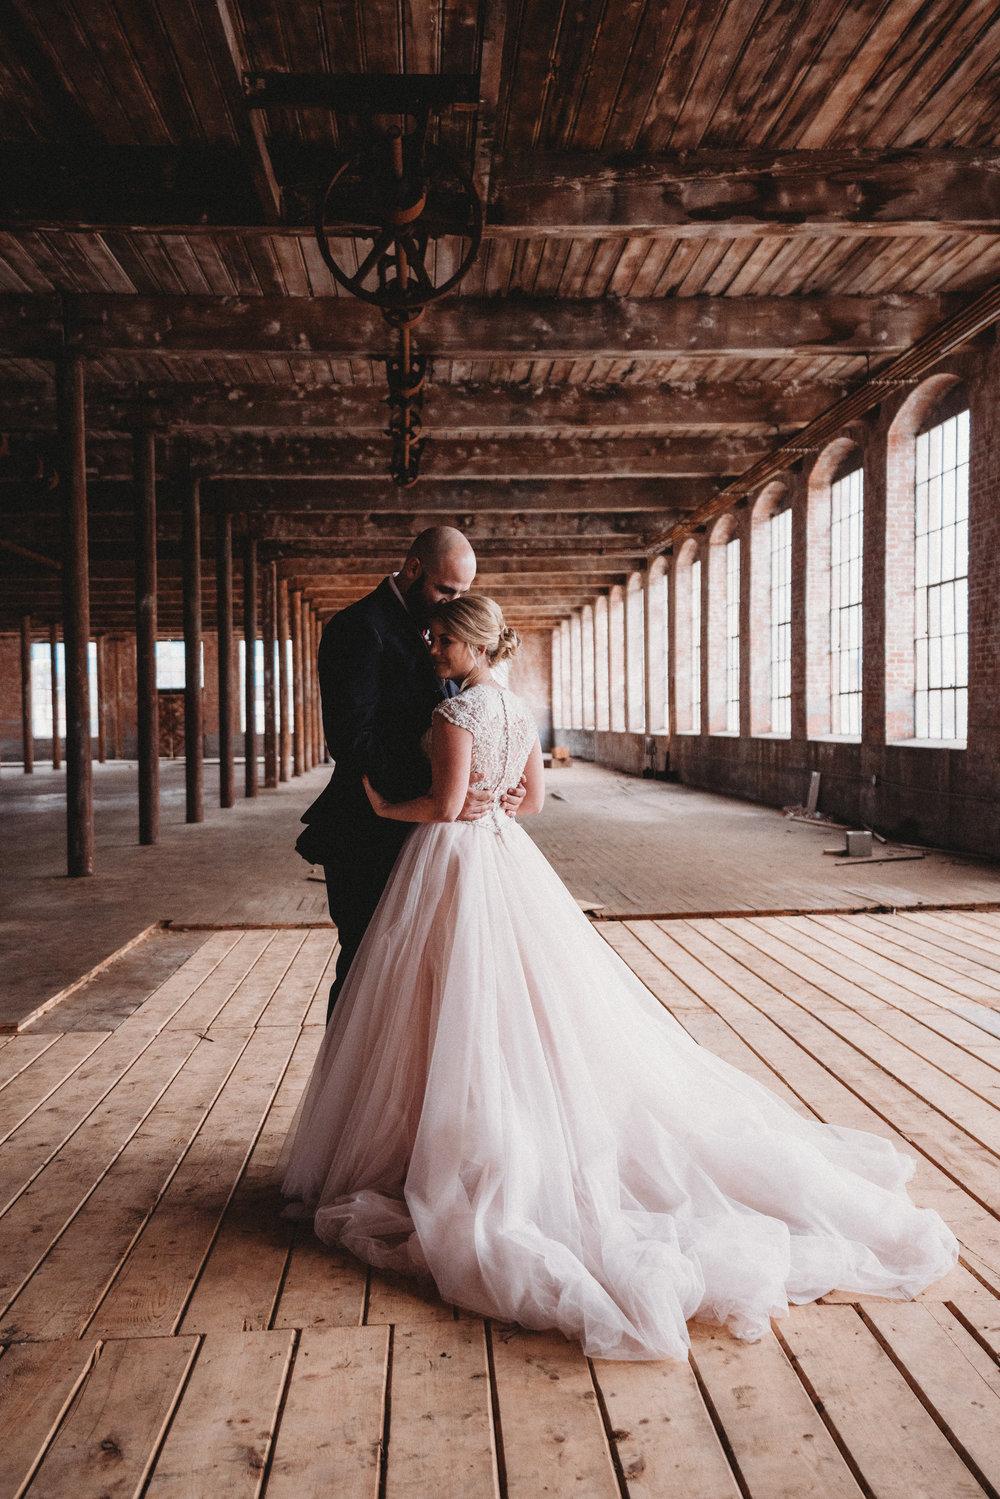 AEPHOTO_Jenna+Jonathan_married-00183.jpg